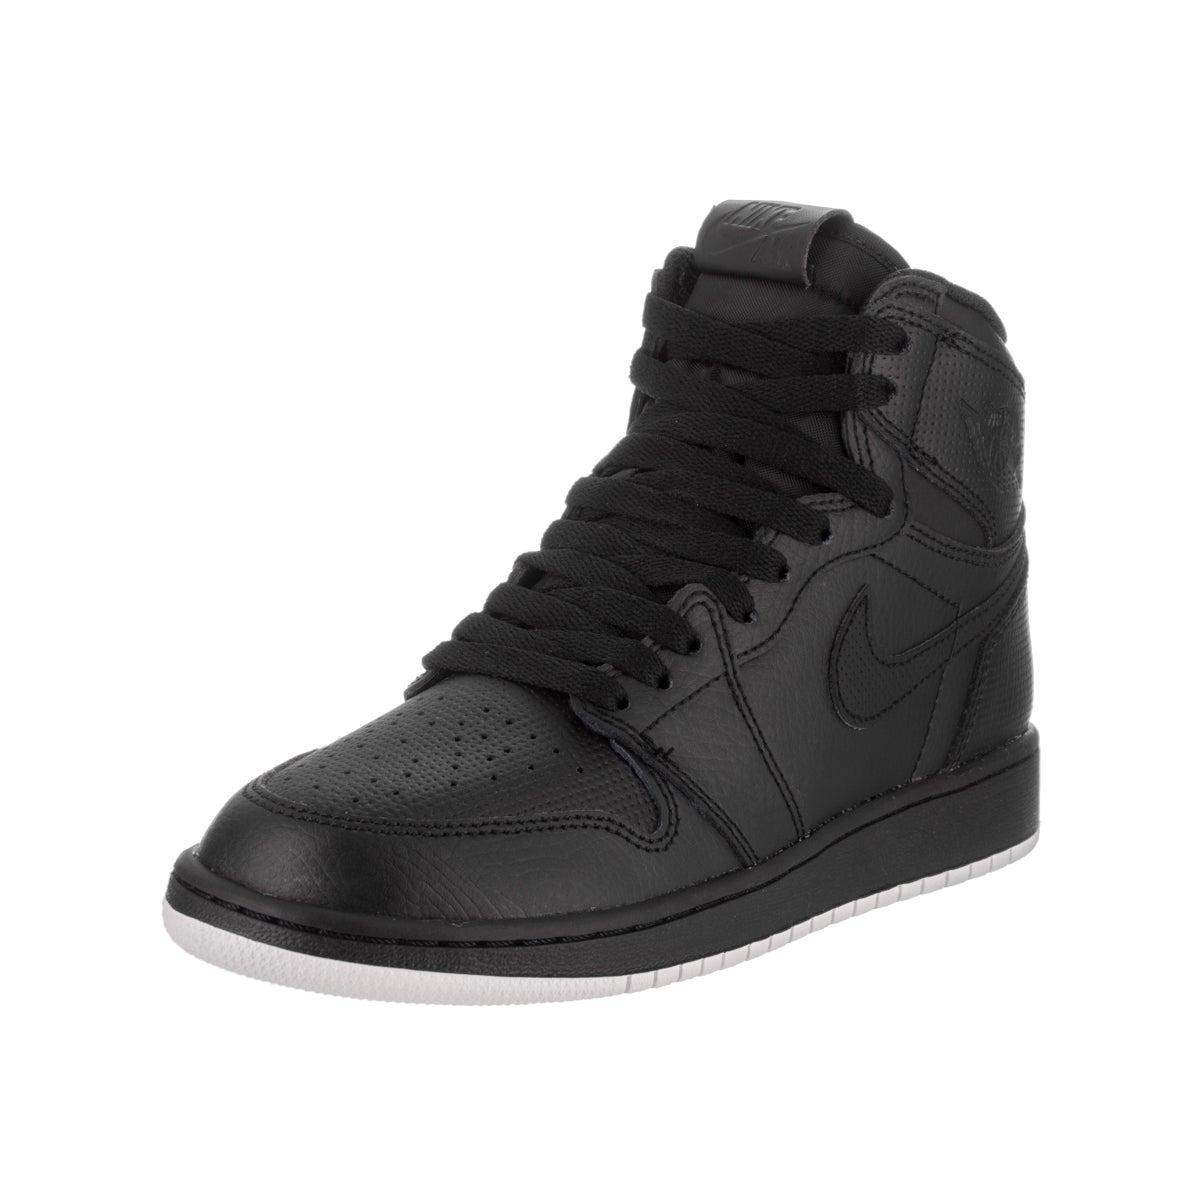 Nike Boys' Air Jordan 1 Retro High OG Bg Black Leather Basketball Shoe (5)